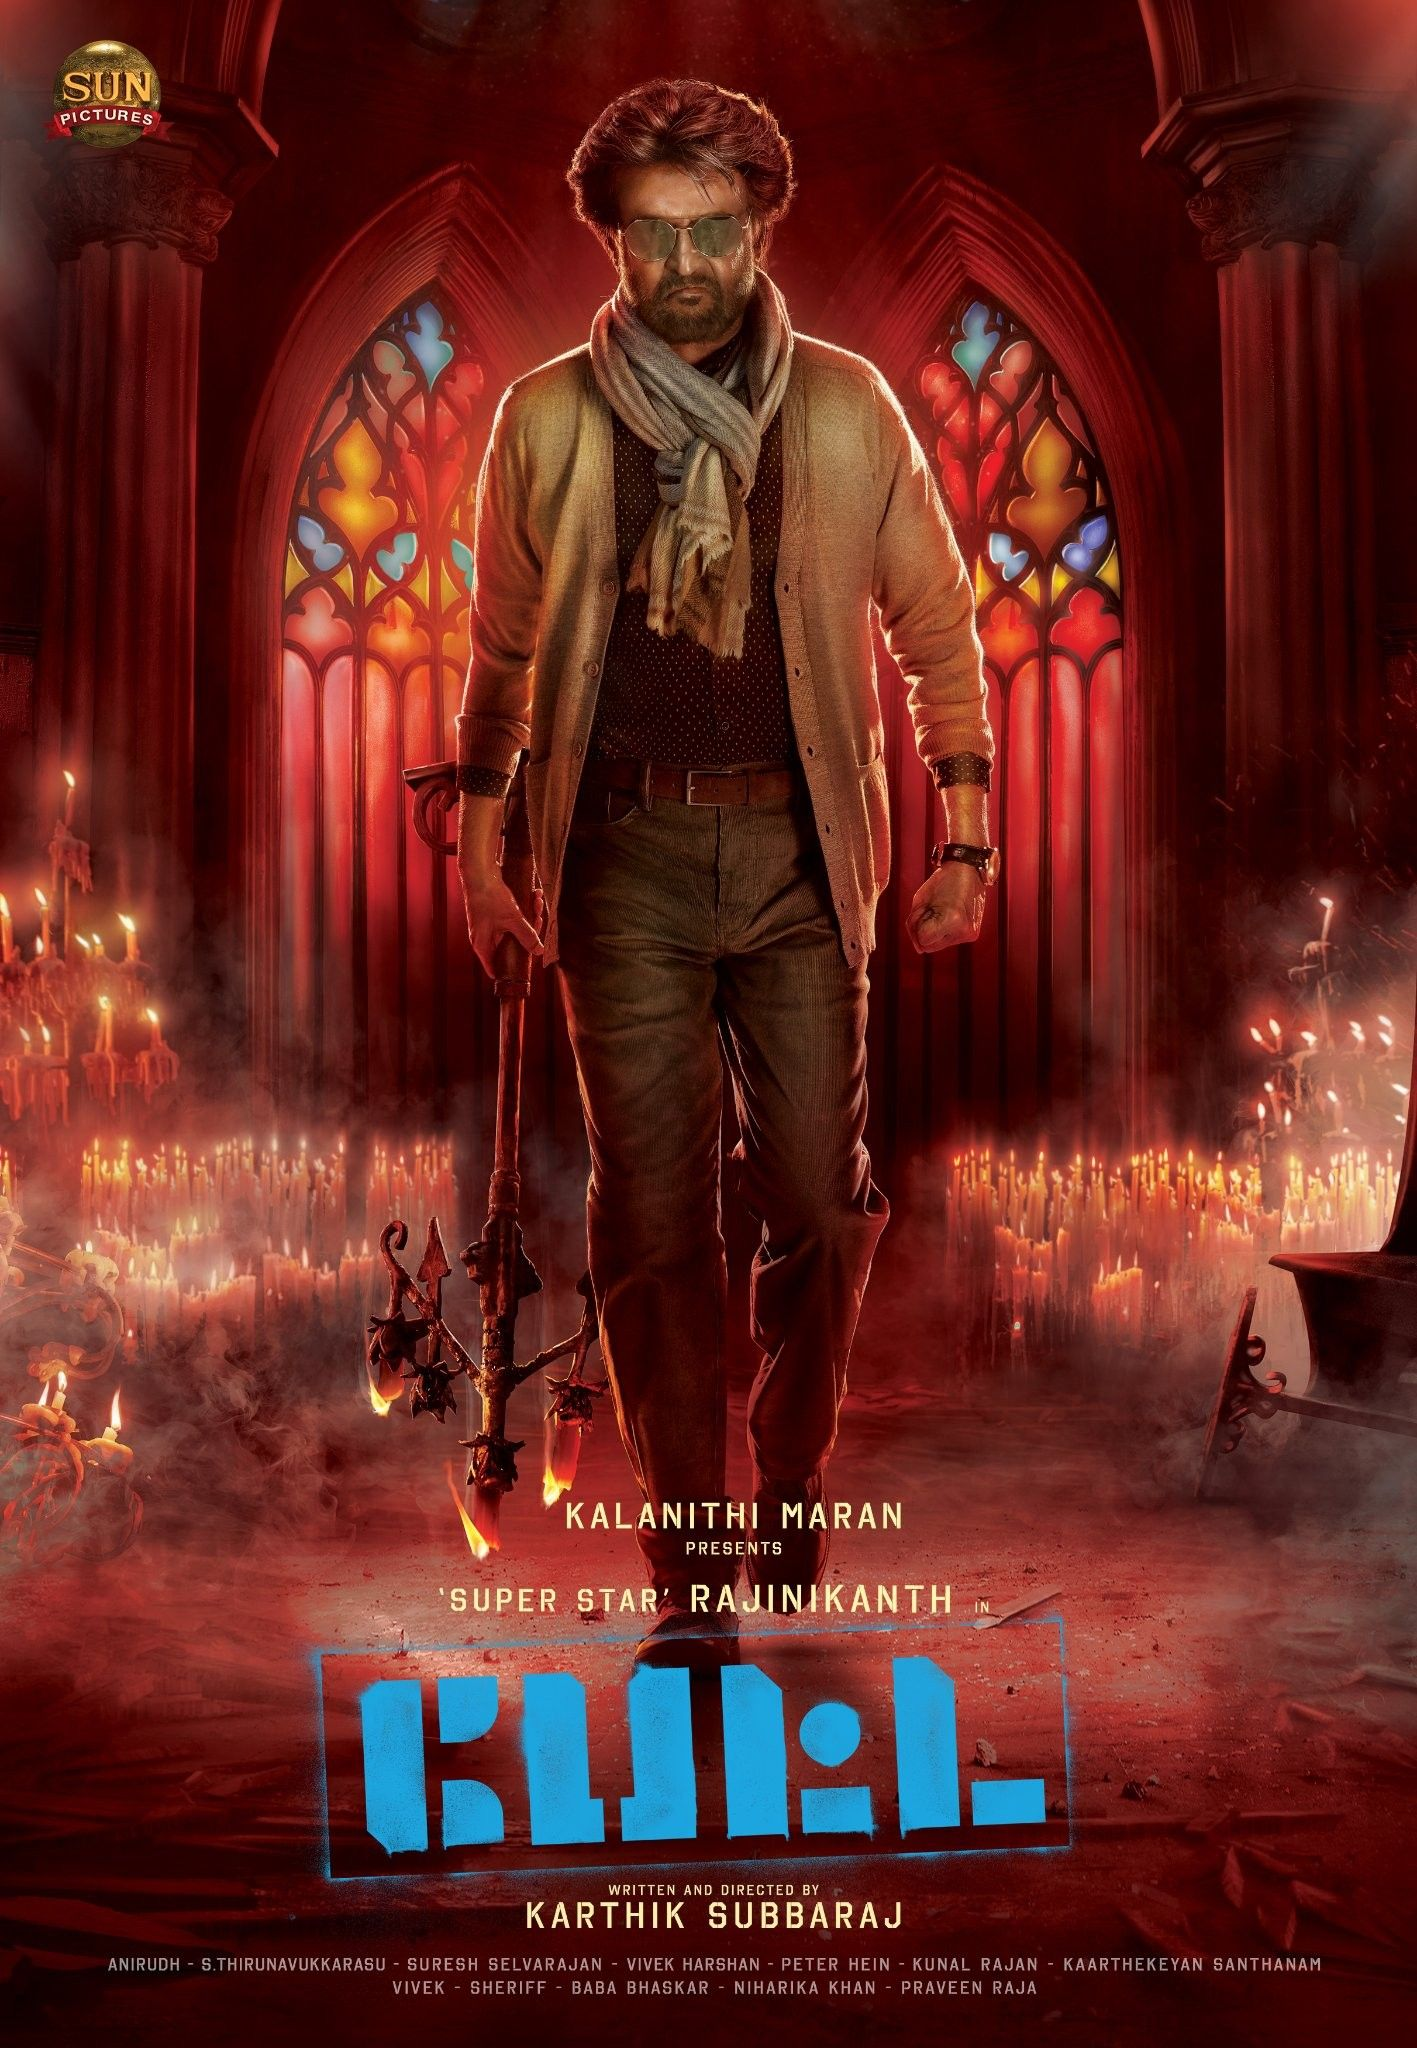 Pin by Sathyan Shivaram on Rajinikanth Download movies